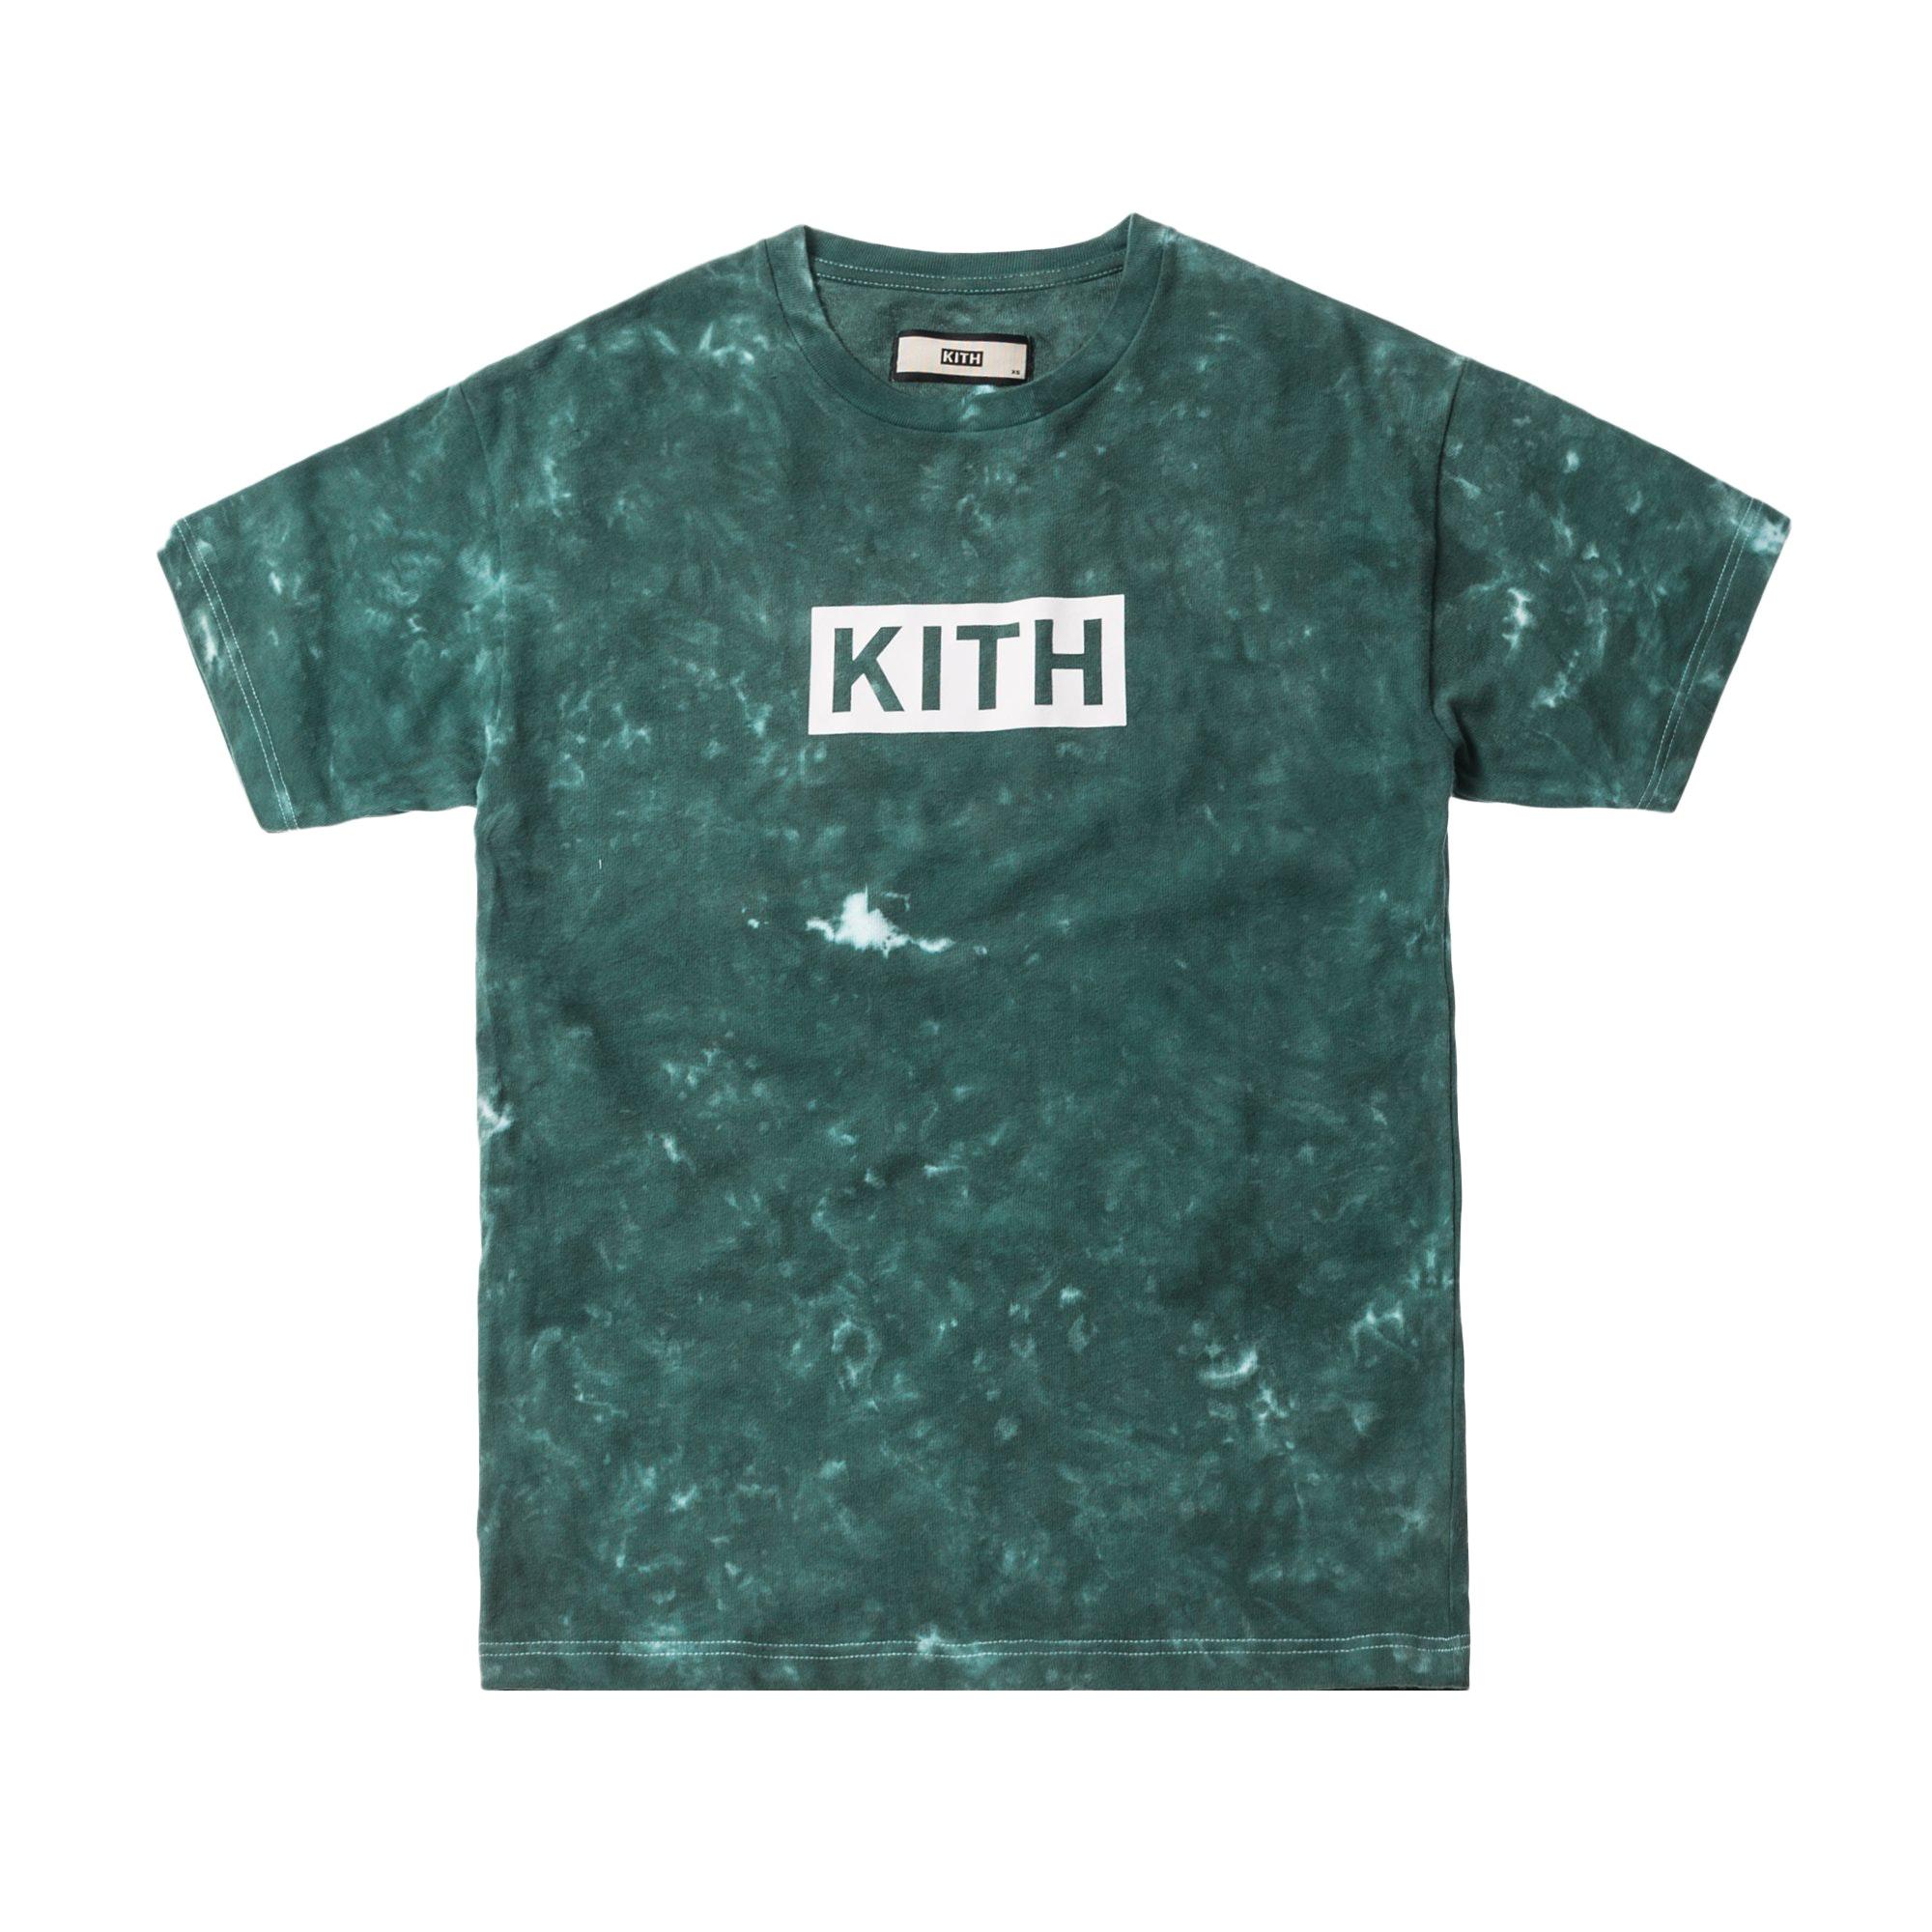 Kith Solid Dye Tee Green